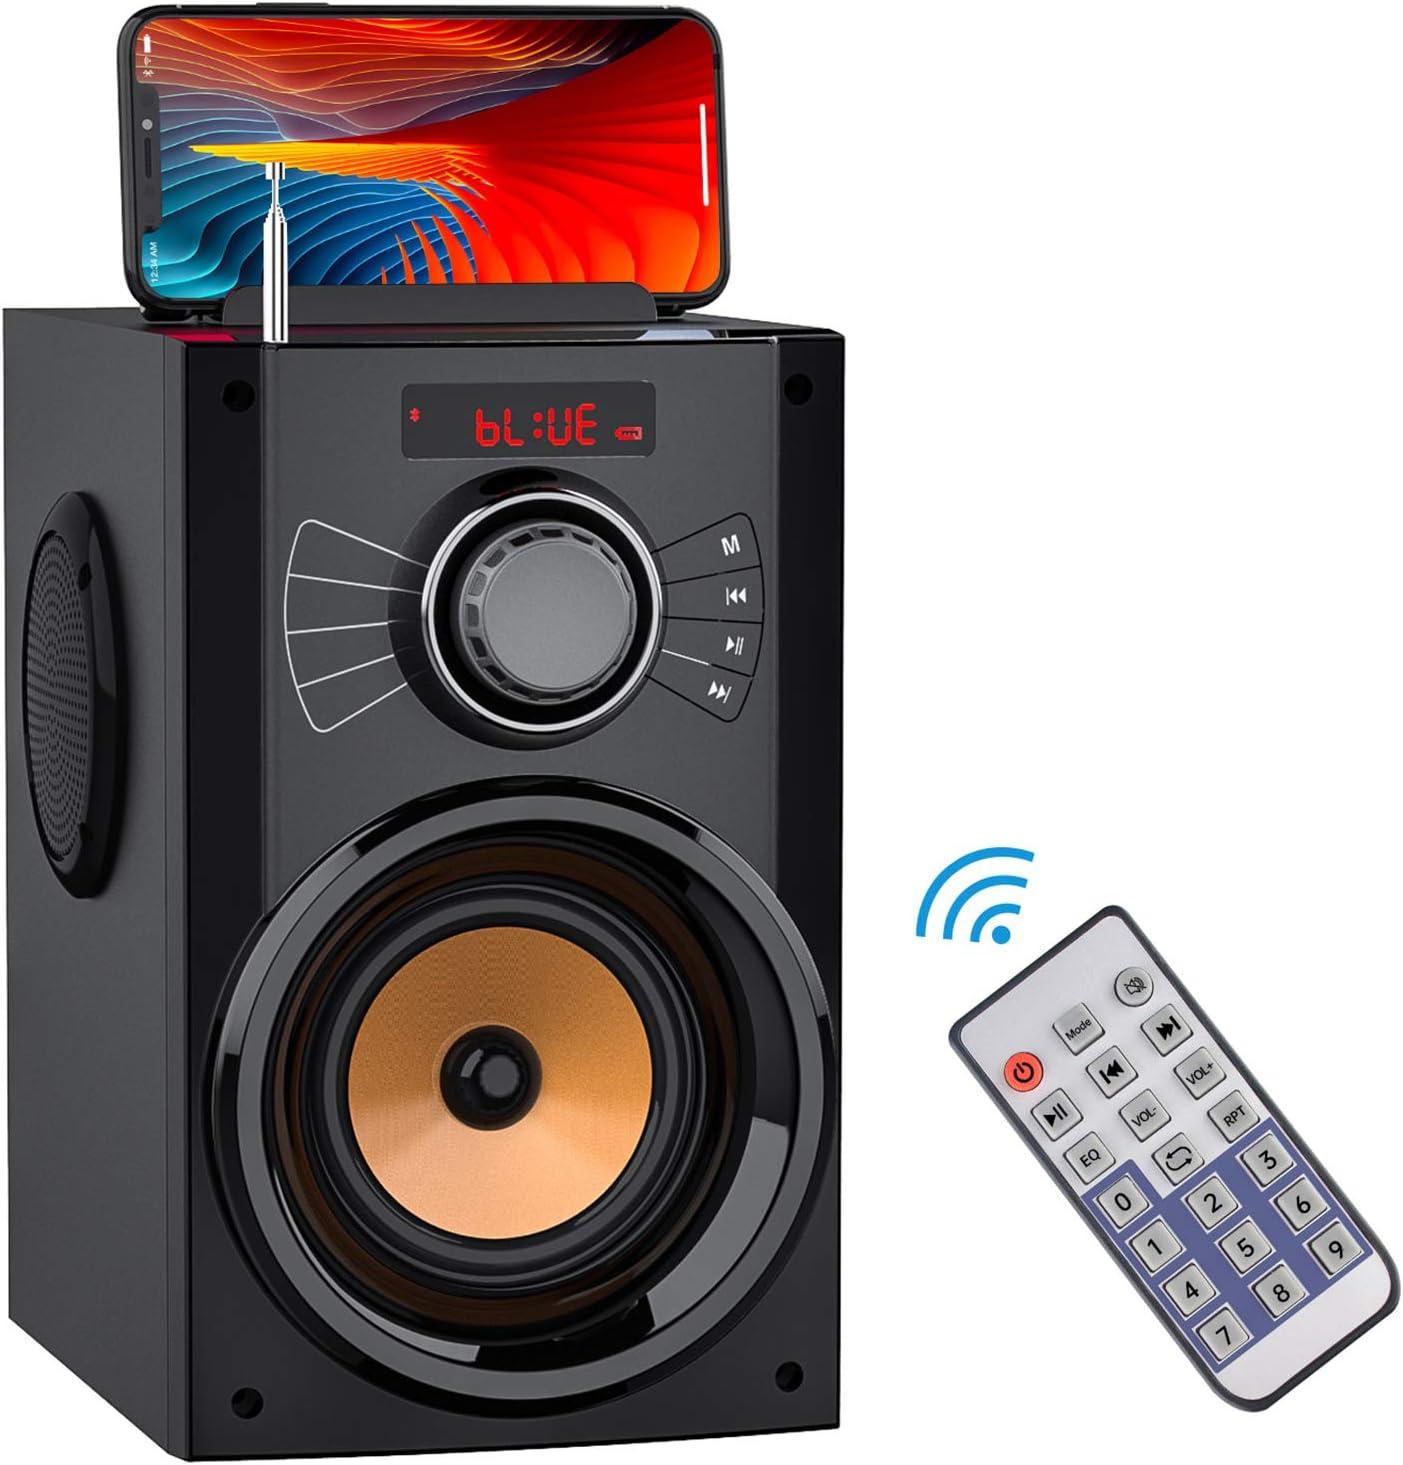 Aesackir 5W Bluetooth Wireless Portable Speaker $18.49 Coupon